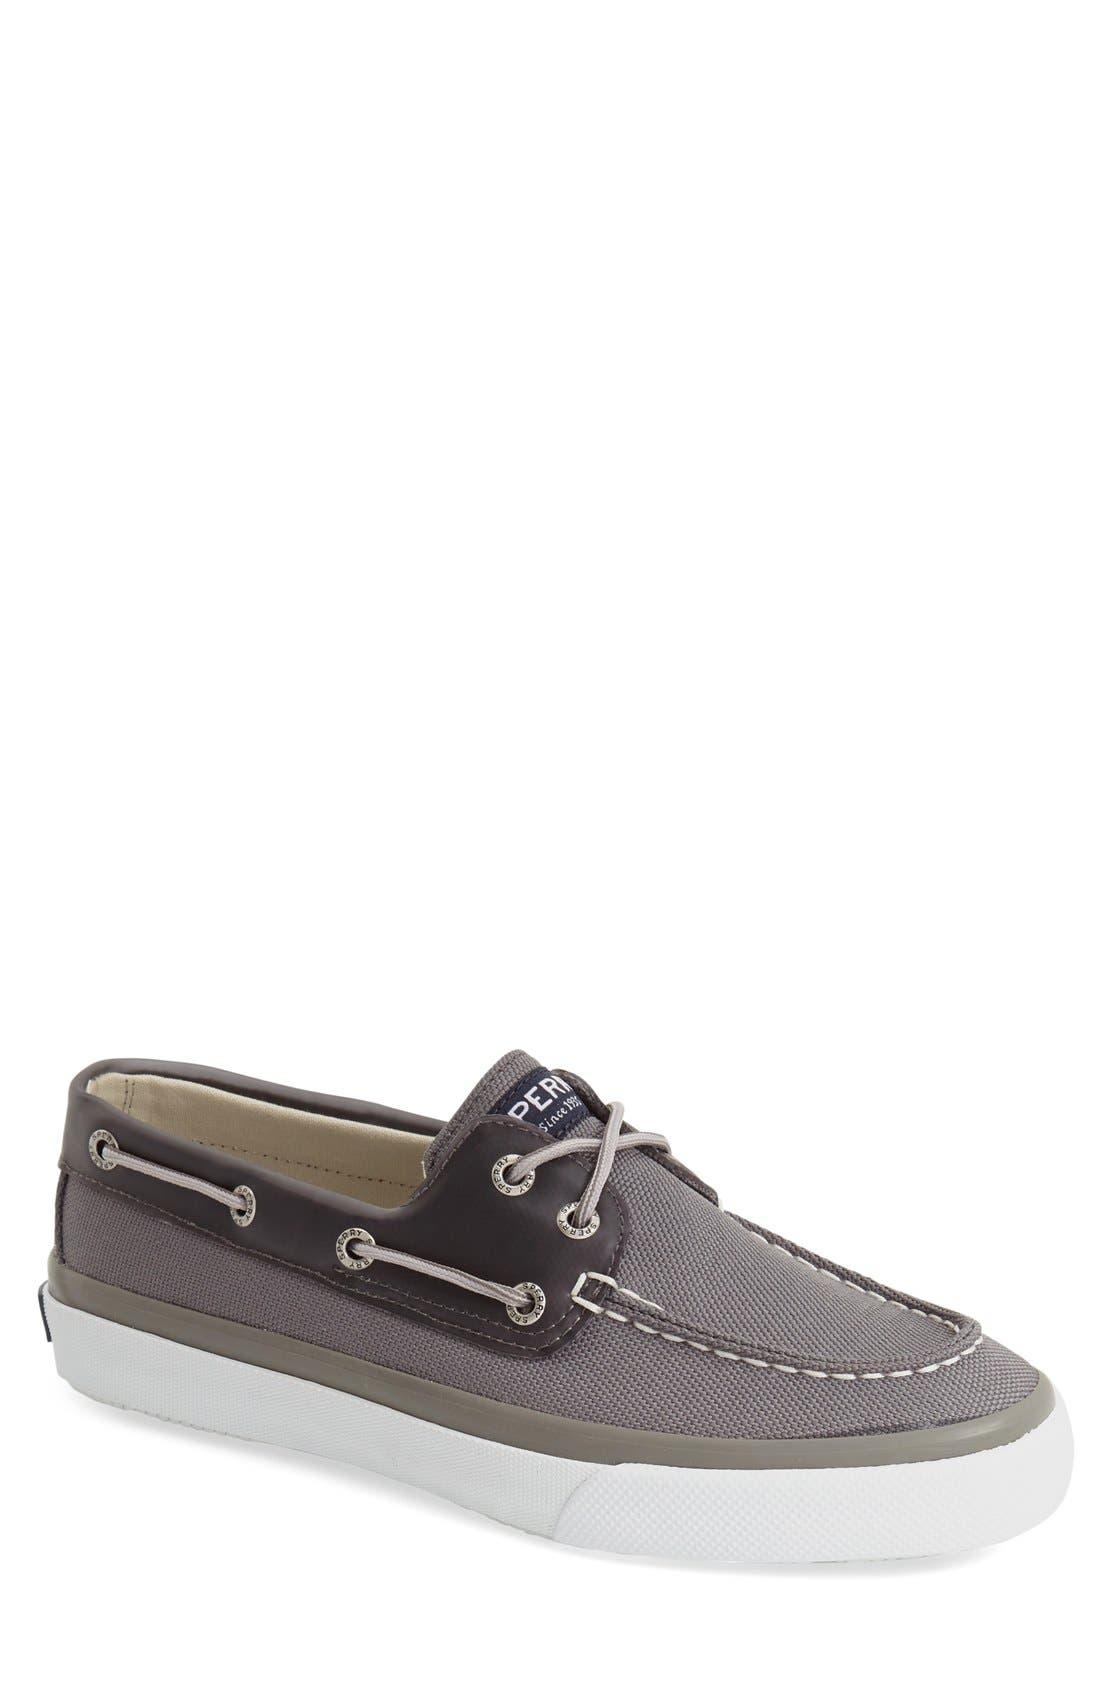 'Bahama 2 Eye Ballistic' Boat Shoe,                         Main,                         color, Grey